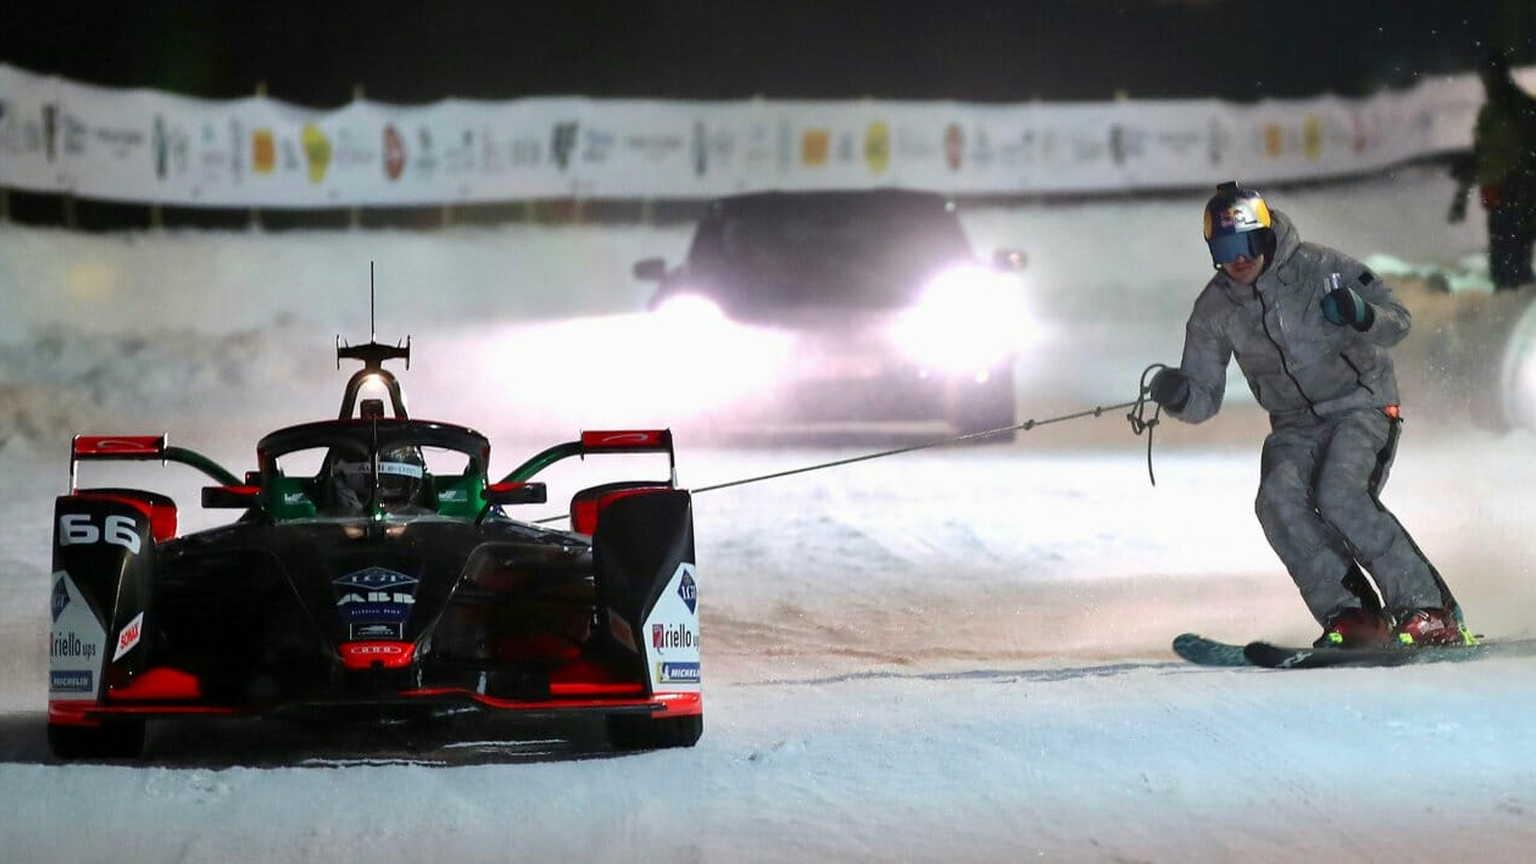 Freestyle skier Benedikt Mayr competes in the Skijoring event